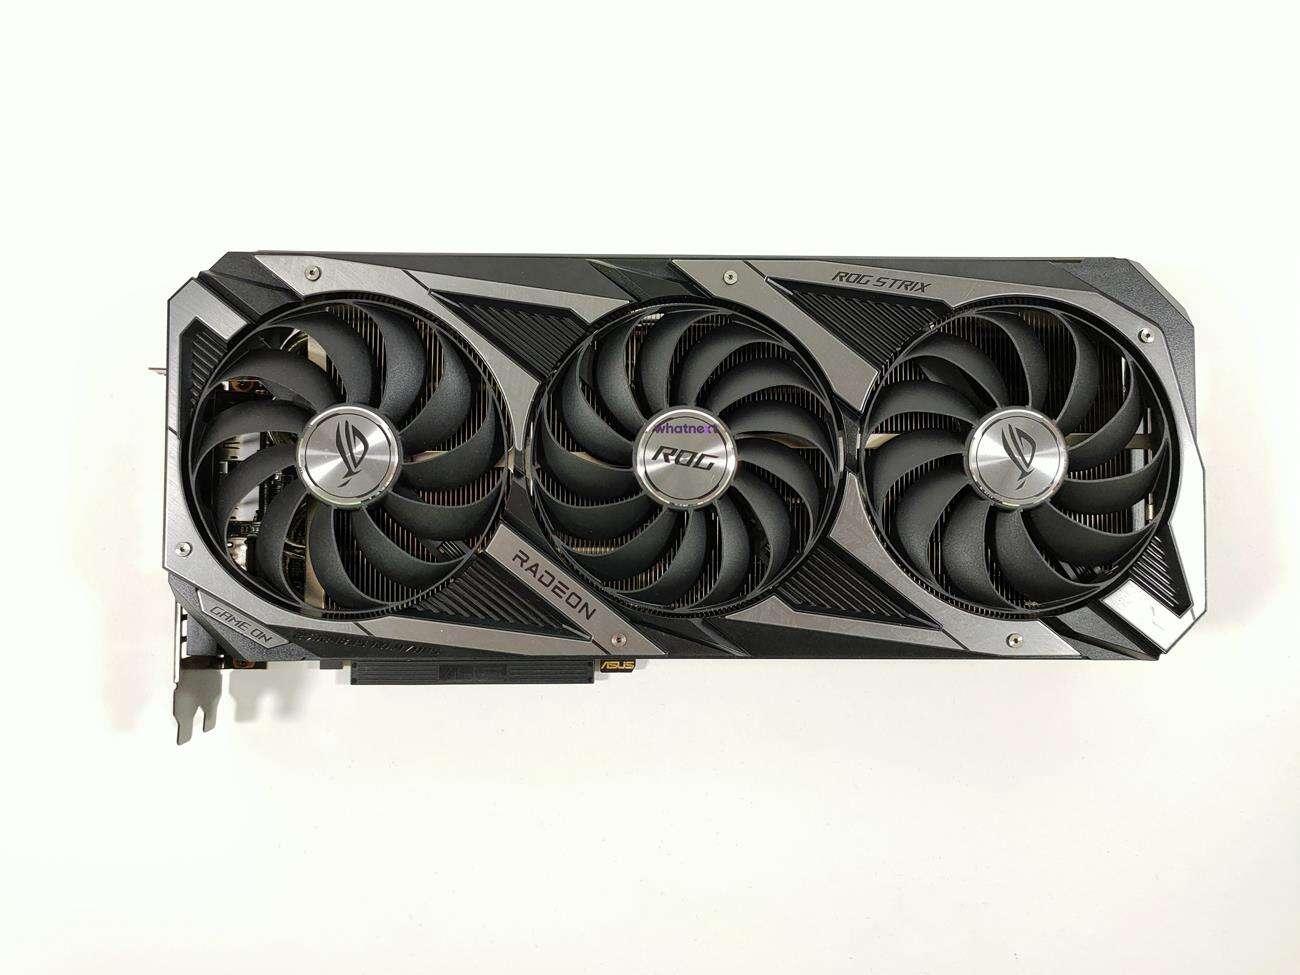 test Asus Radeon RX 6700 XT ROG Strix OC, recenzja Asus Radeon RX 6700 XT ROG Strix OC, opinia Asus Radeon RX 6700 XT ROG Strix OC